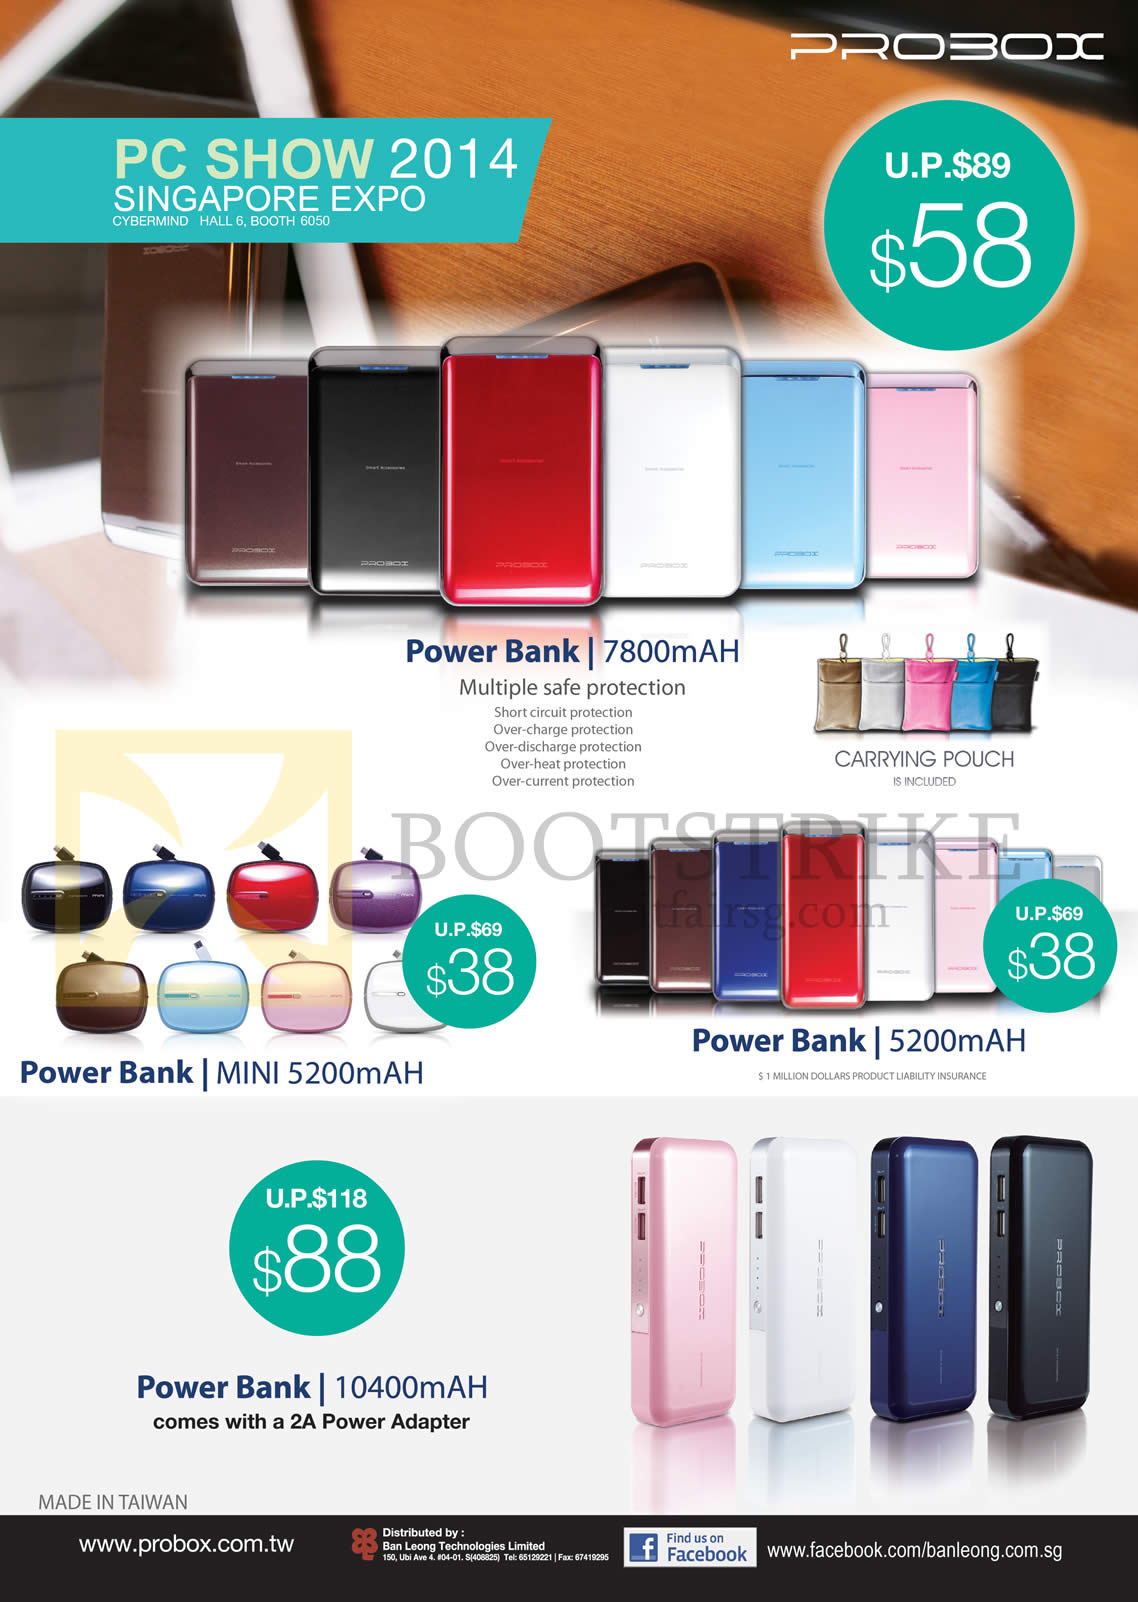 PC SHOW 2014 price list image brochure of Cybermind Probox Power Banks 7800mAH, 5200mAH, 10400mAH, Mini 5200mAH